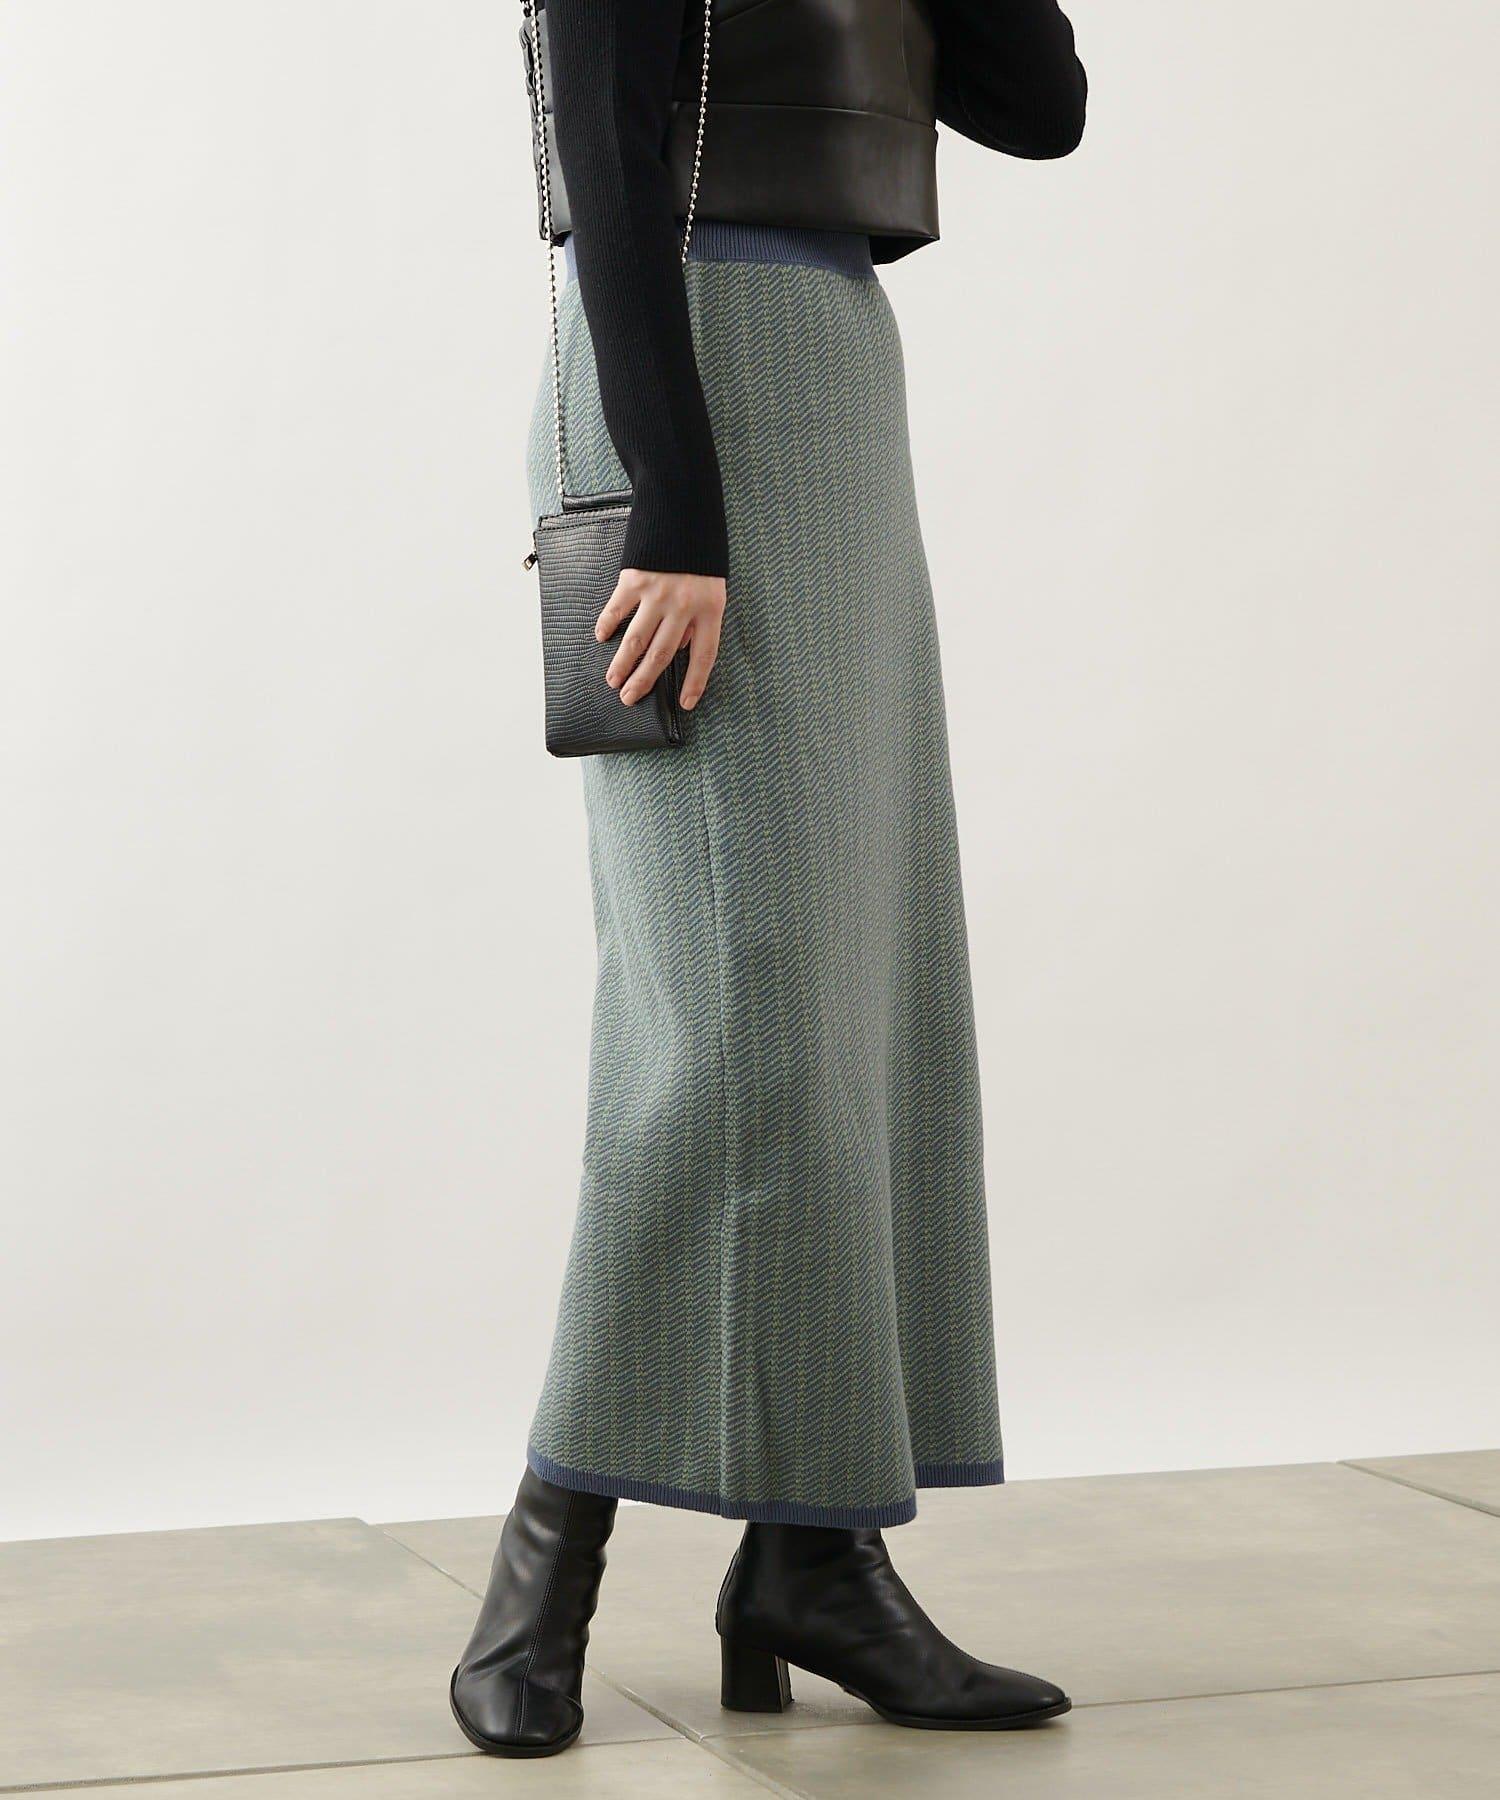 COLONY 2139(コロニー トゥーワンスリーナイン) レディース バイカラージャガードニットスカート(セットアップ可) ブルー